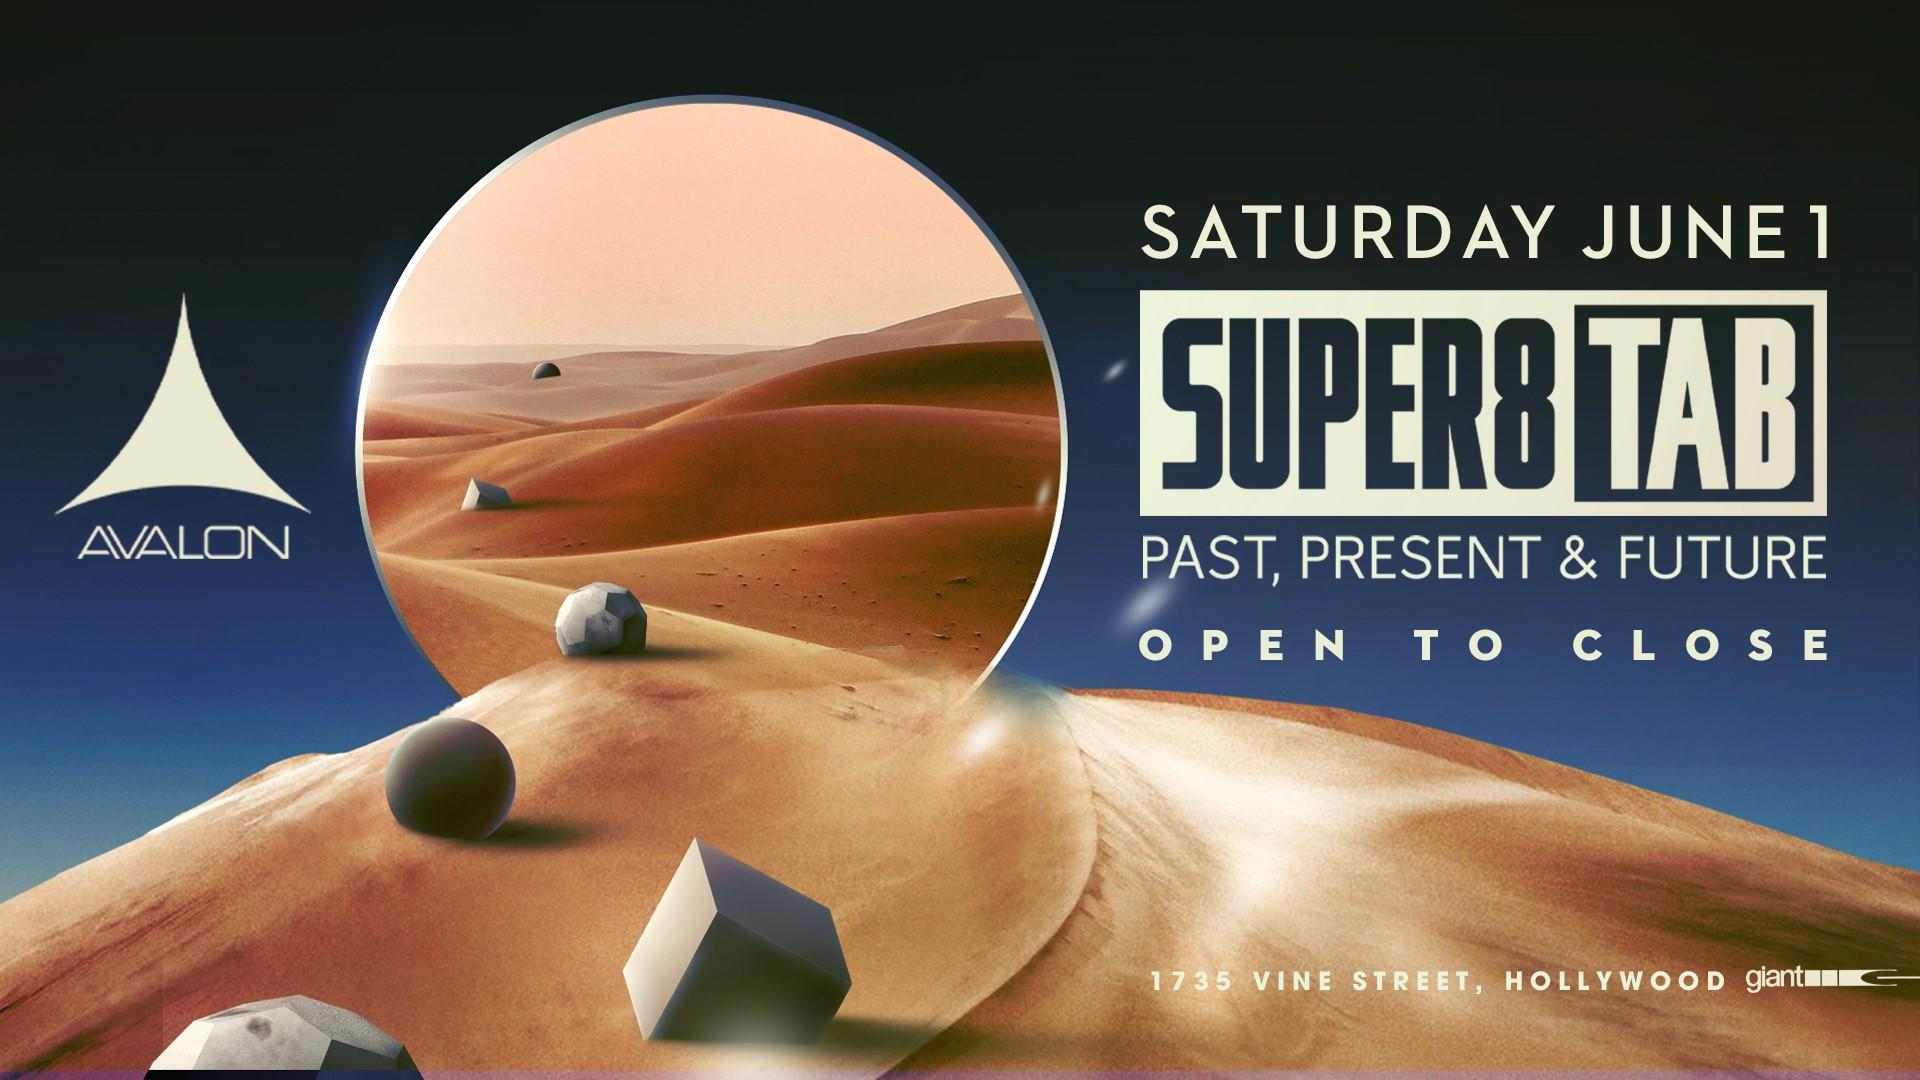 Super8 & Tab | Past, Present & Future OTC at Avalon Hollywood